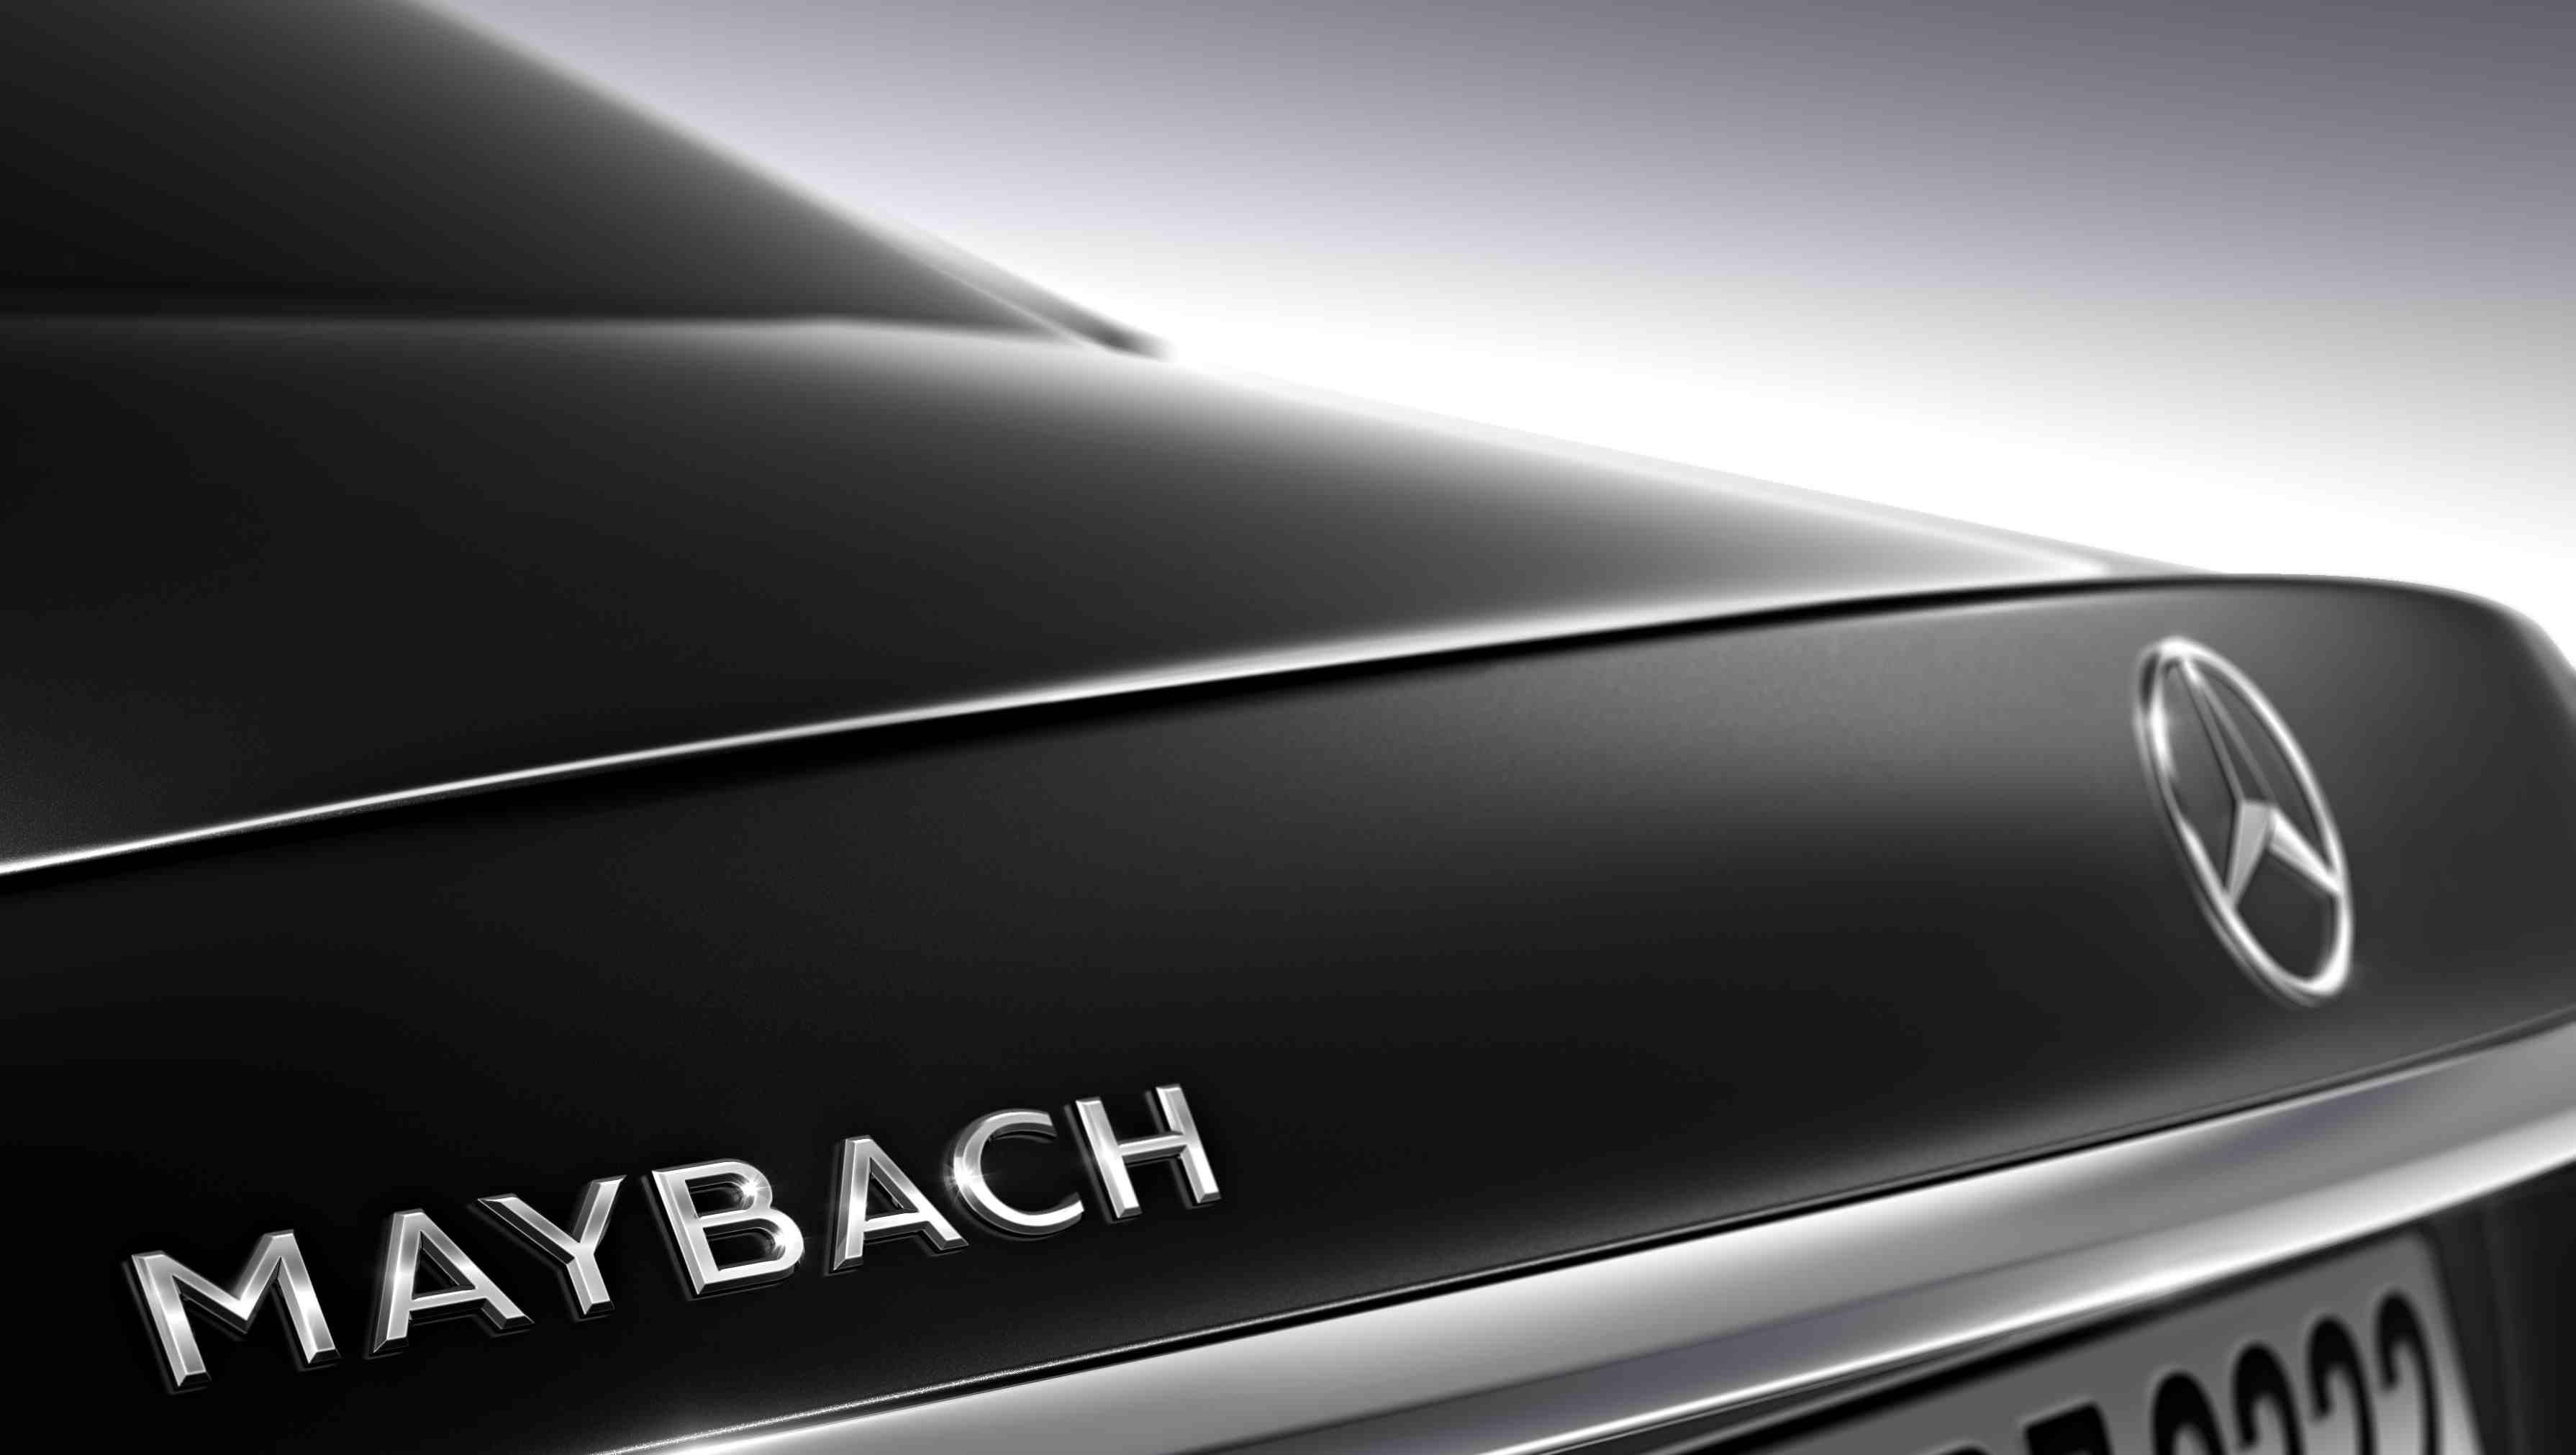 Mercedes Maybach Suv Confirmed